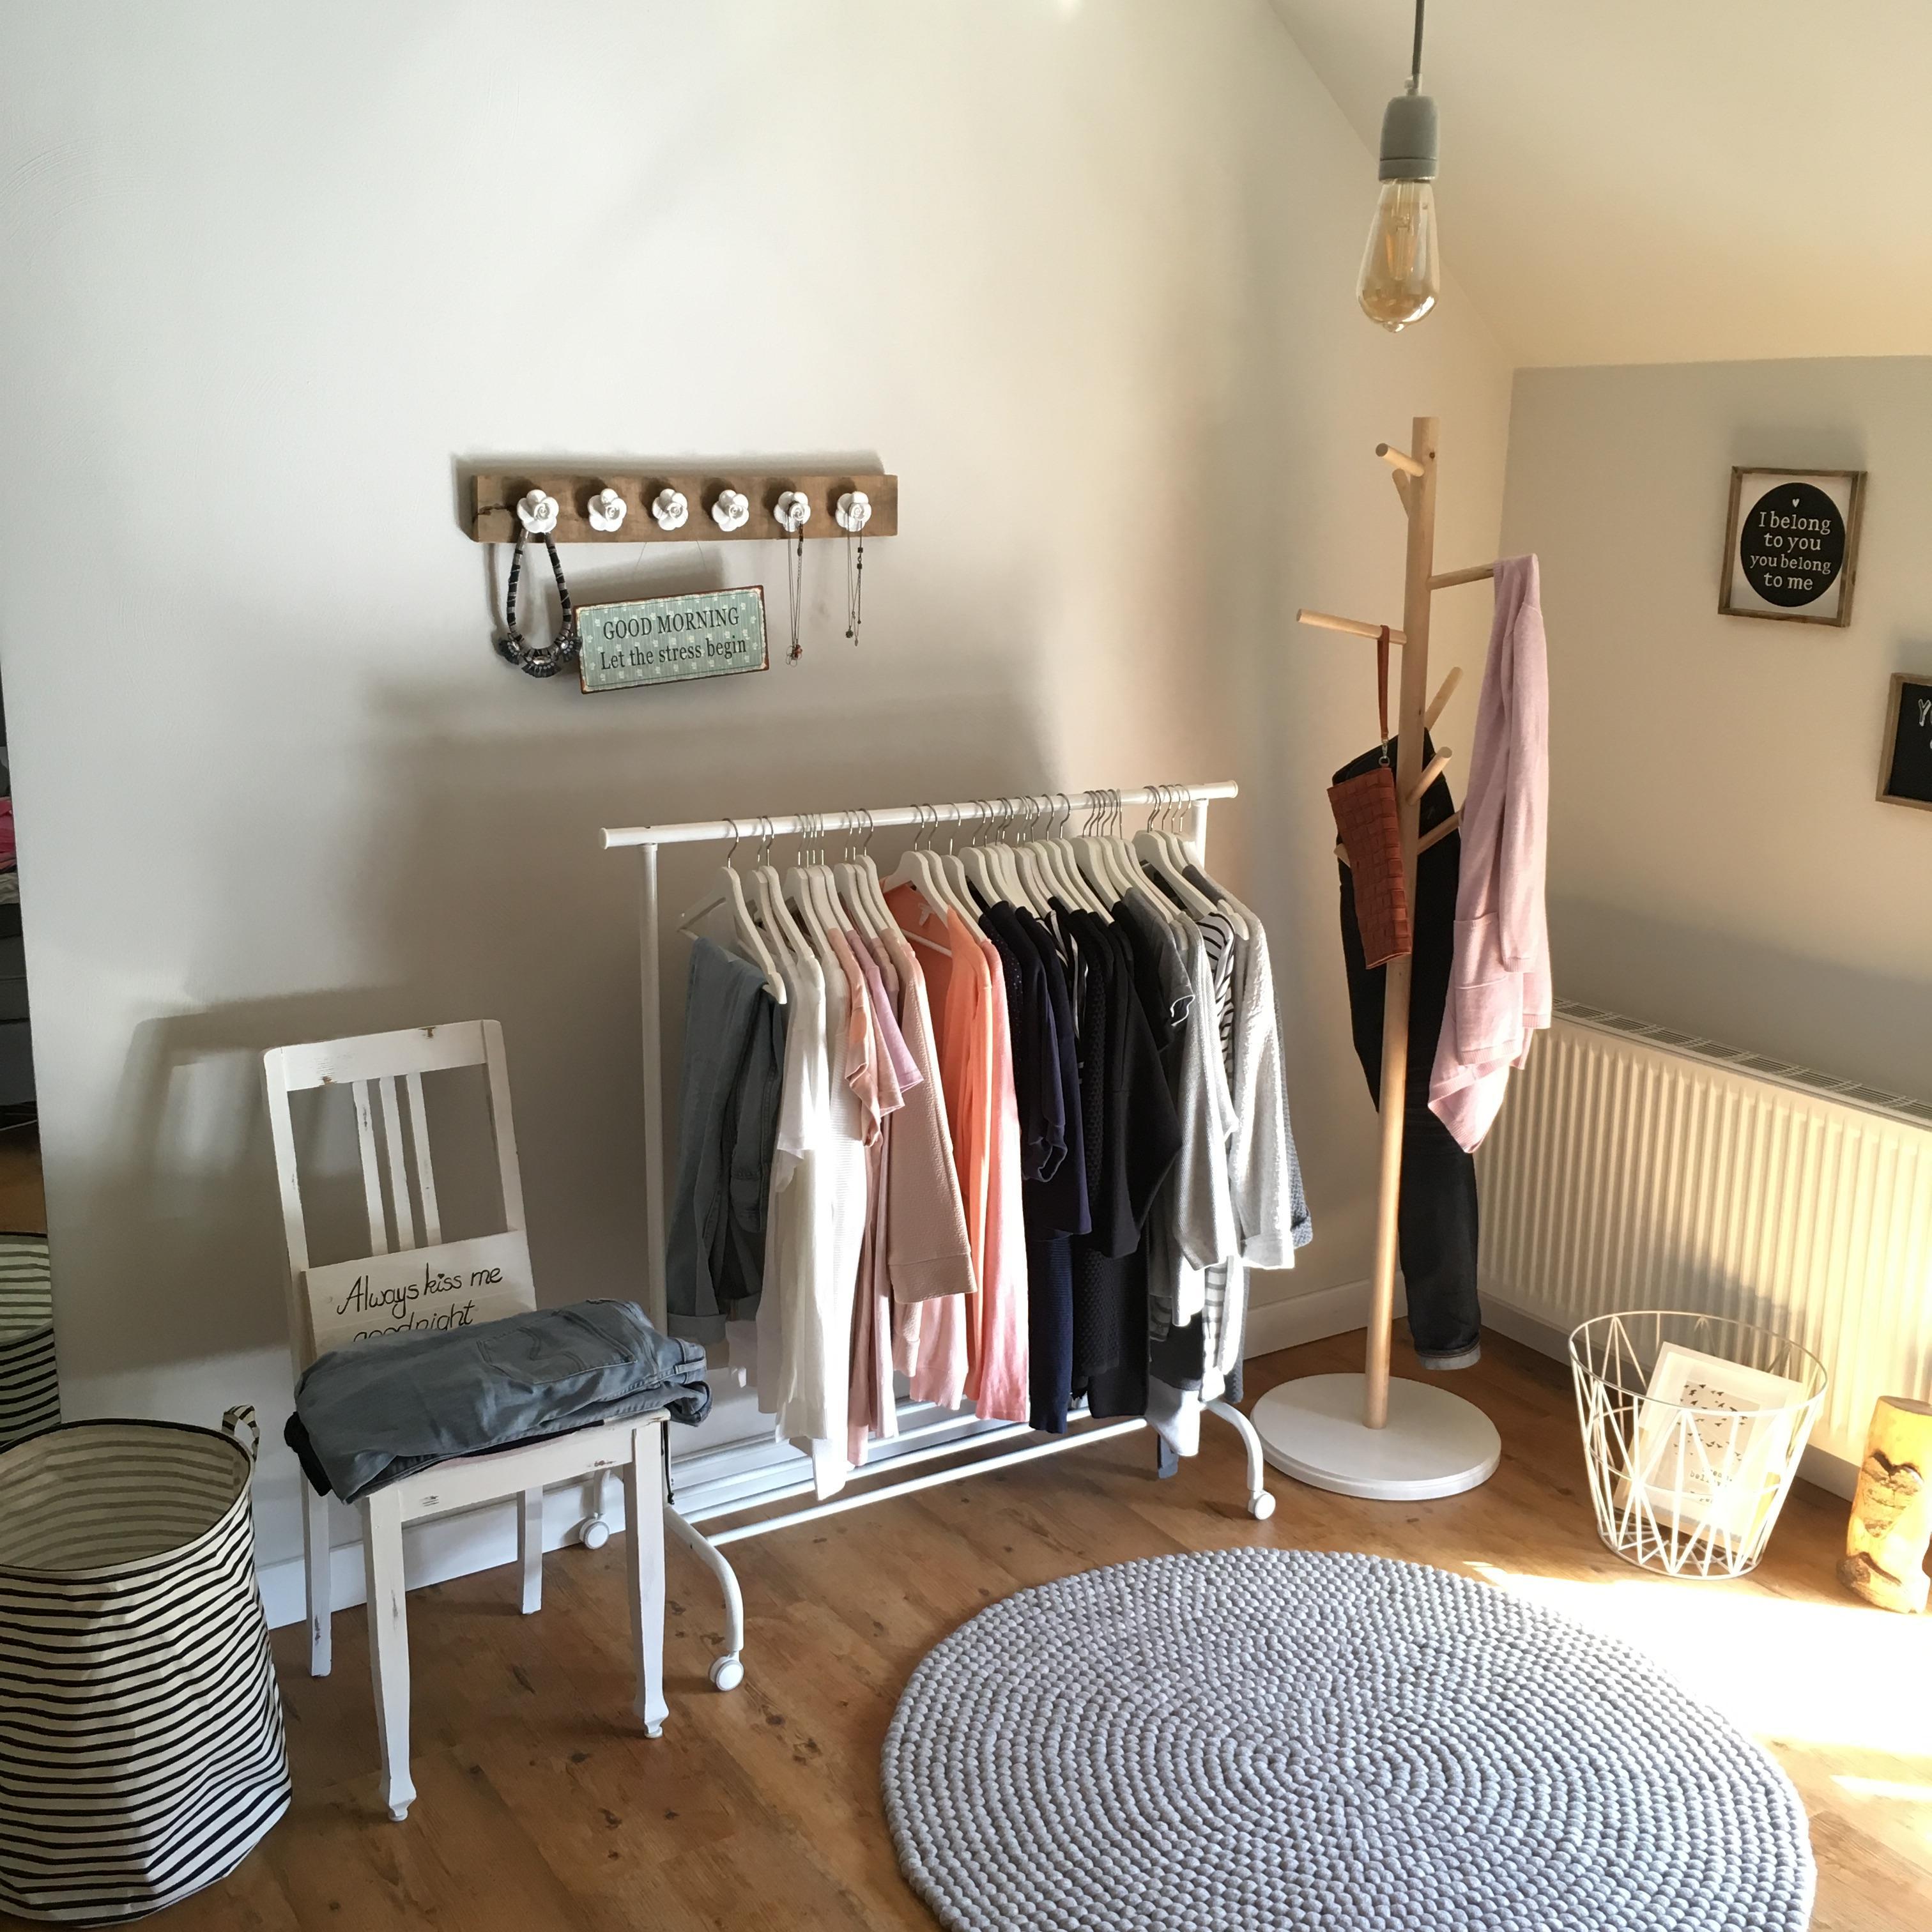 kleiderstange bilder ideen couchstyle. Black Bedroom Furniture Sets. Home Design Ideas